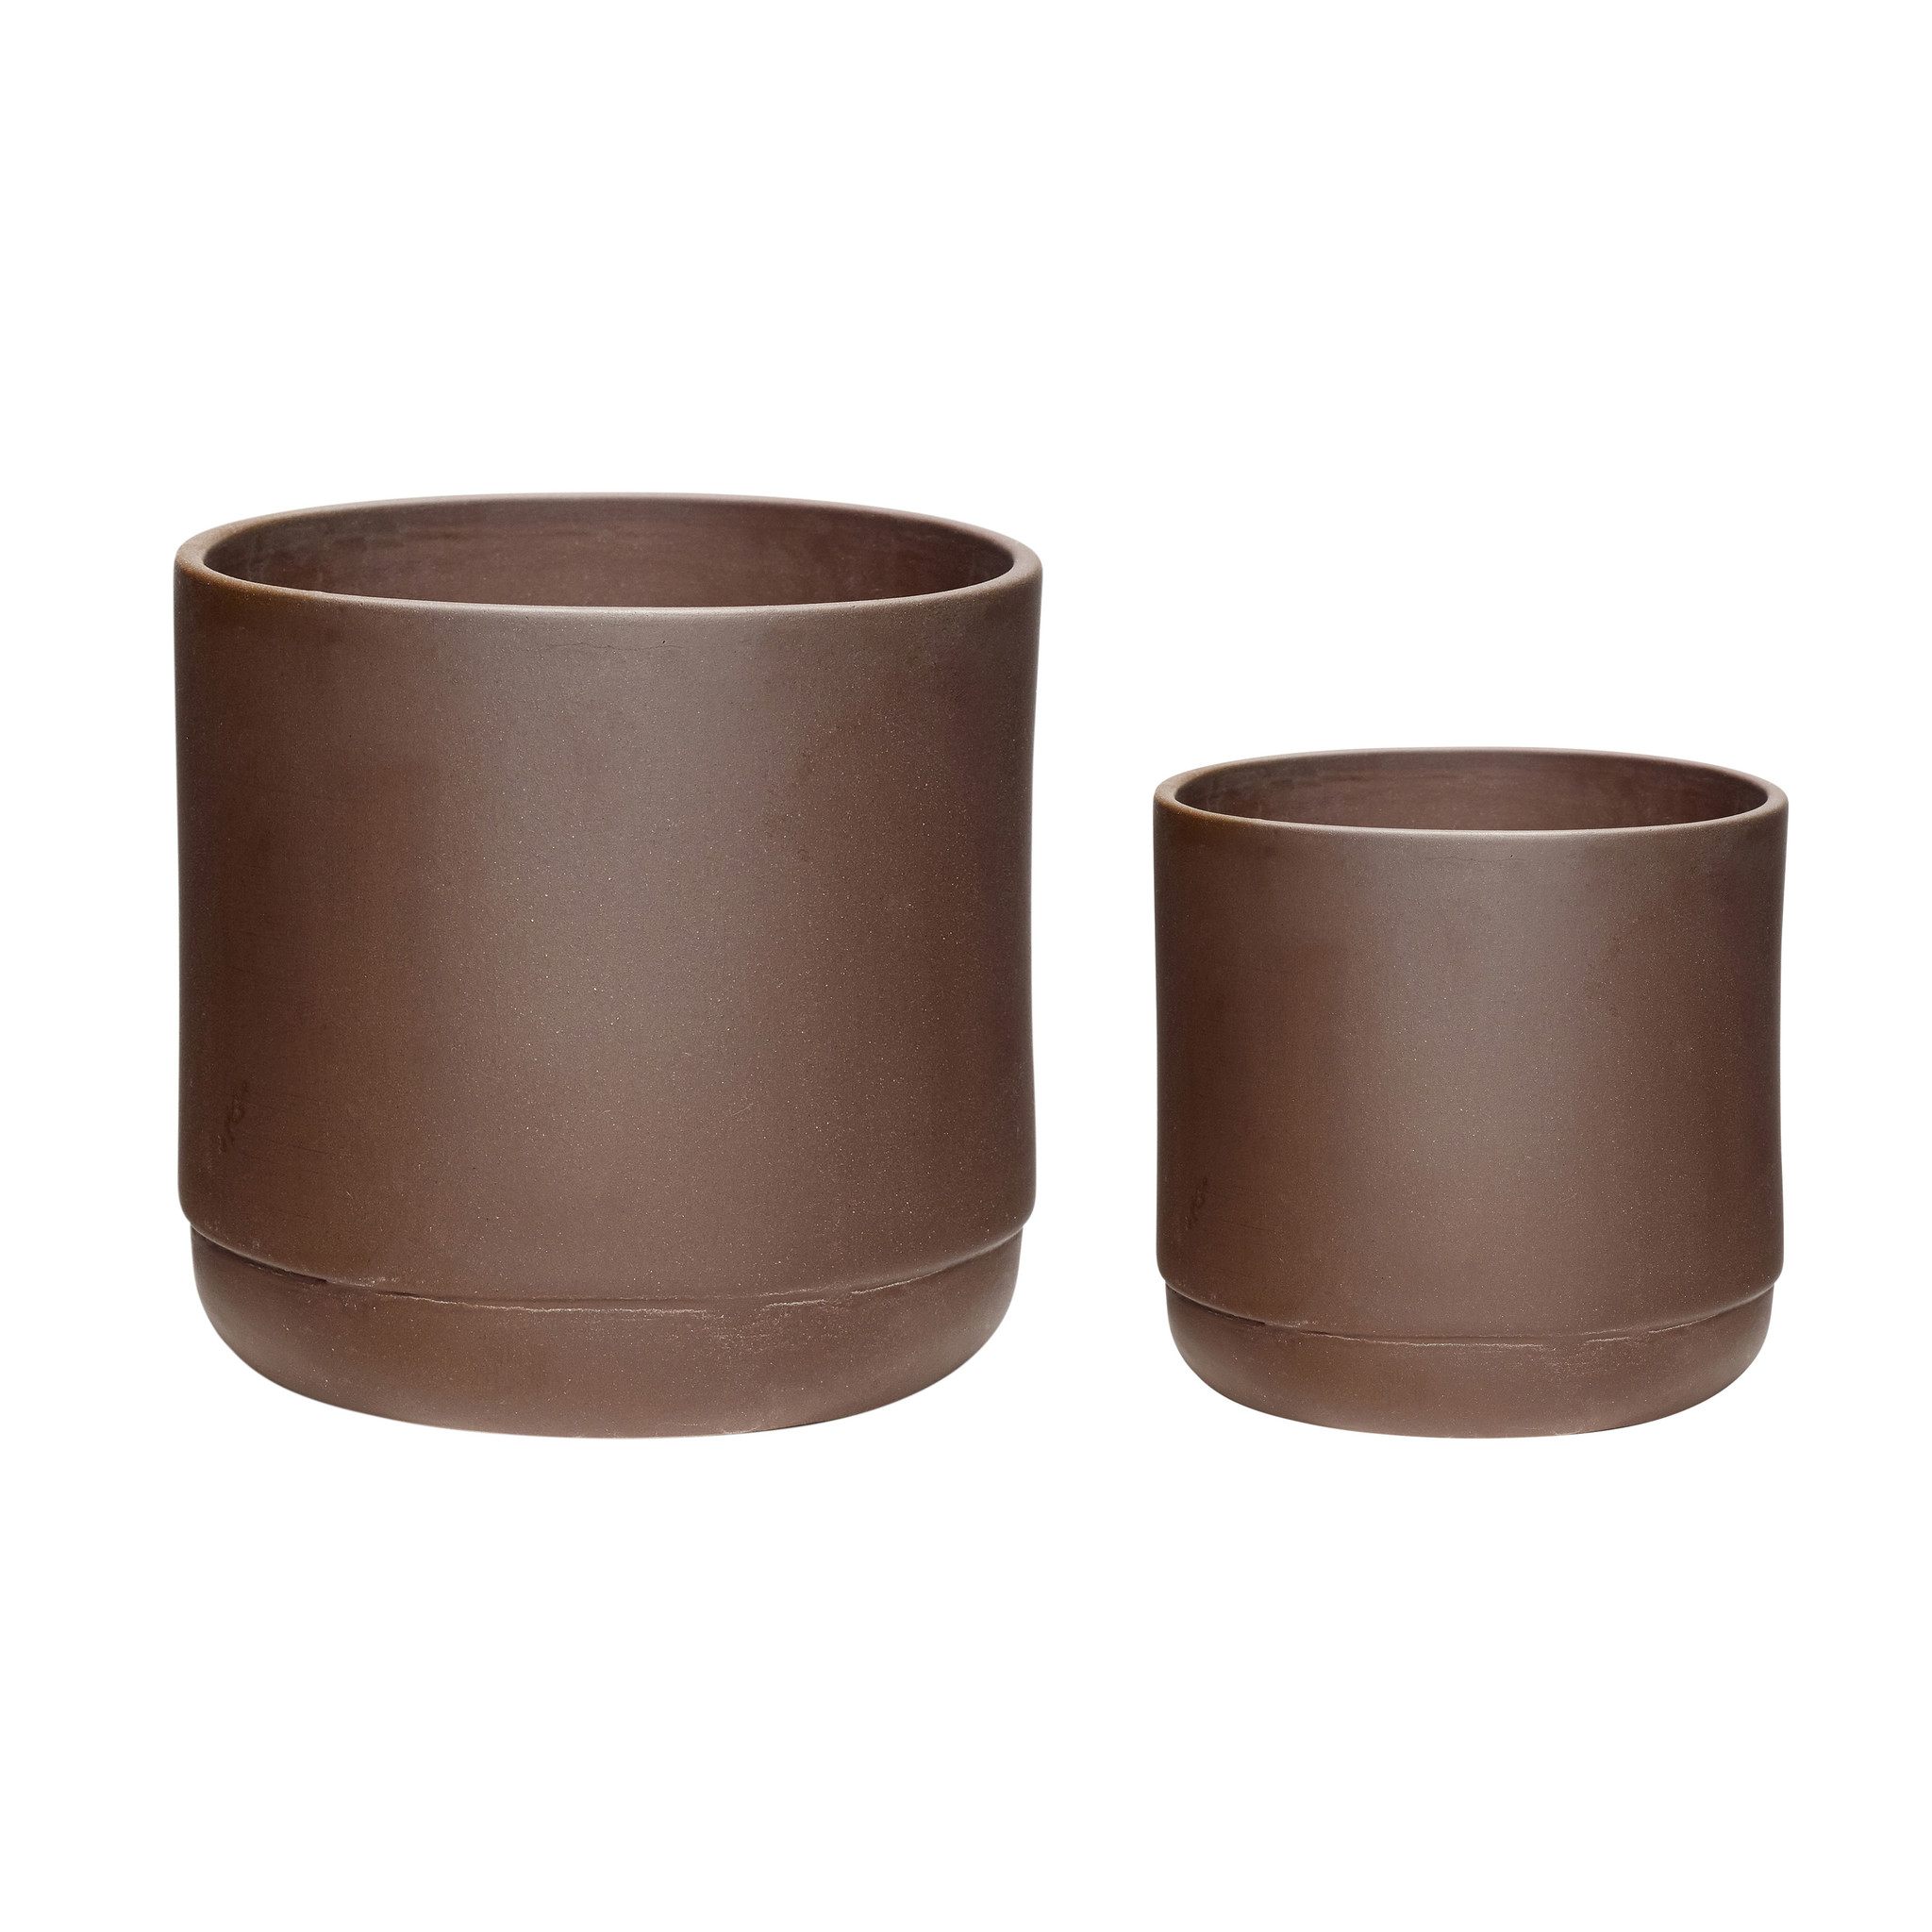 Hubsch Pot, keramiek, bordeaux, set van 2-760801-5712772061398